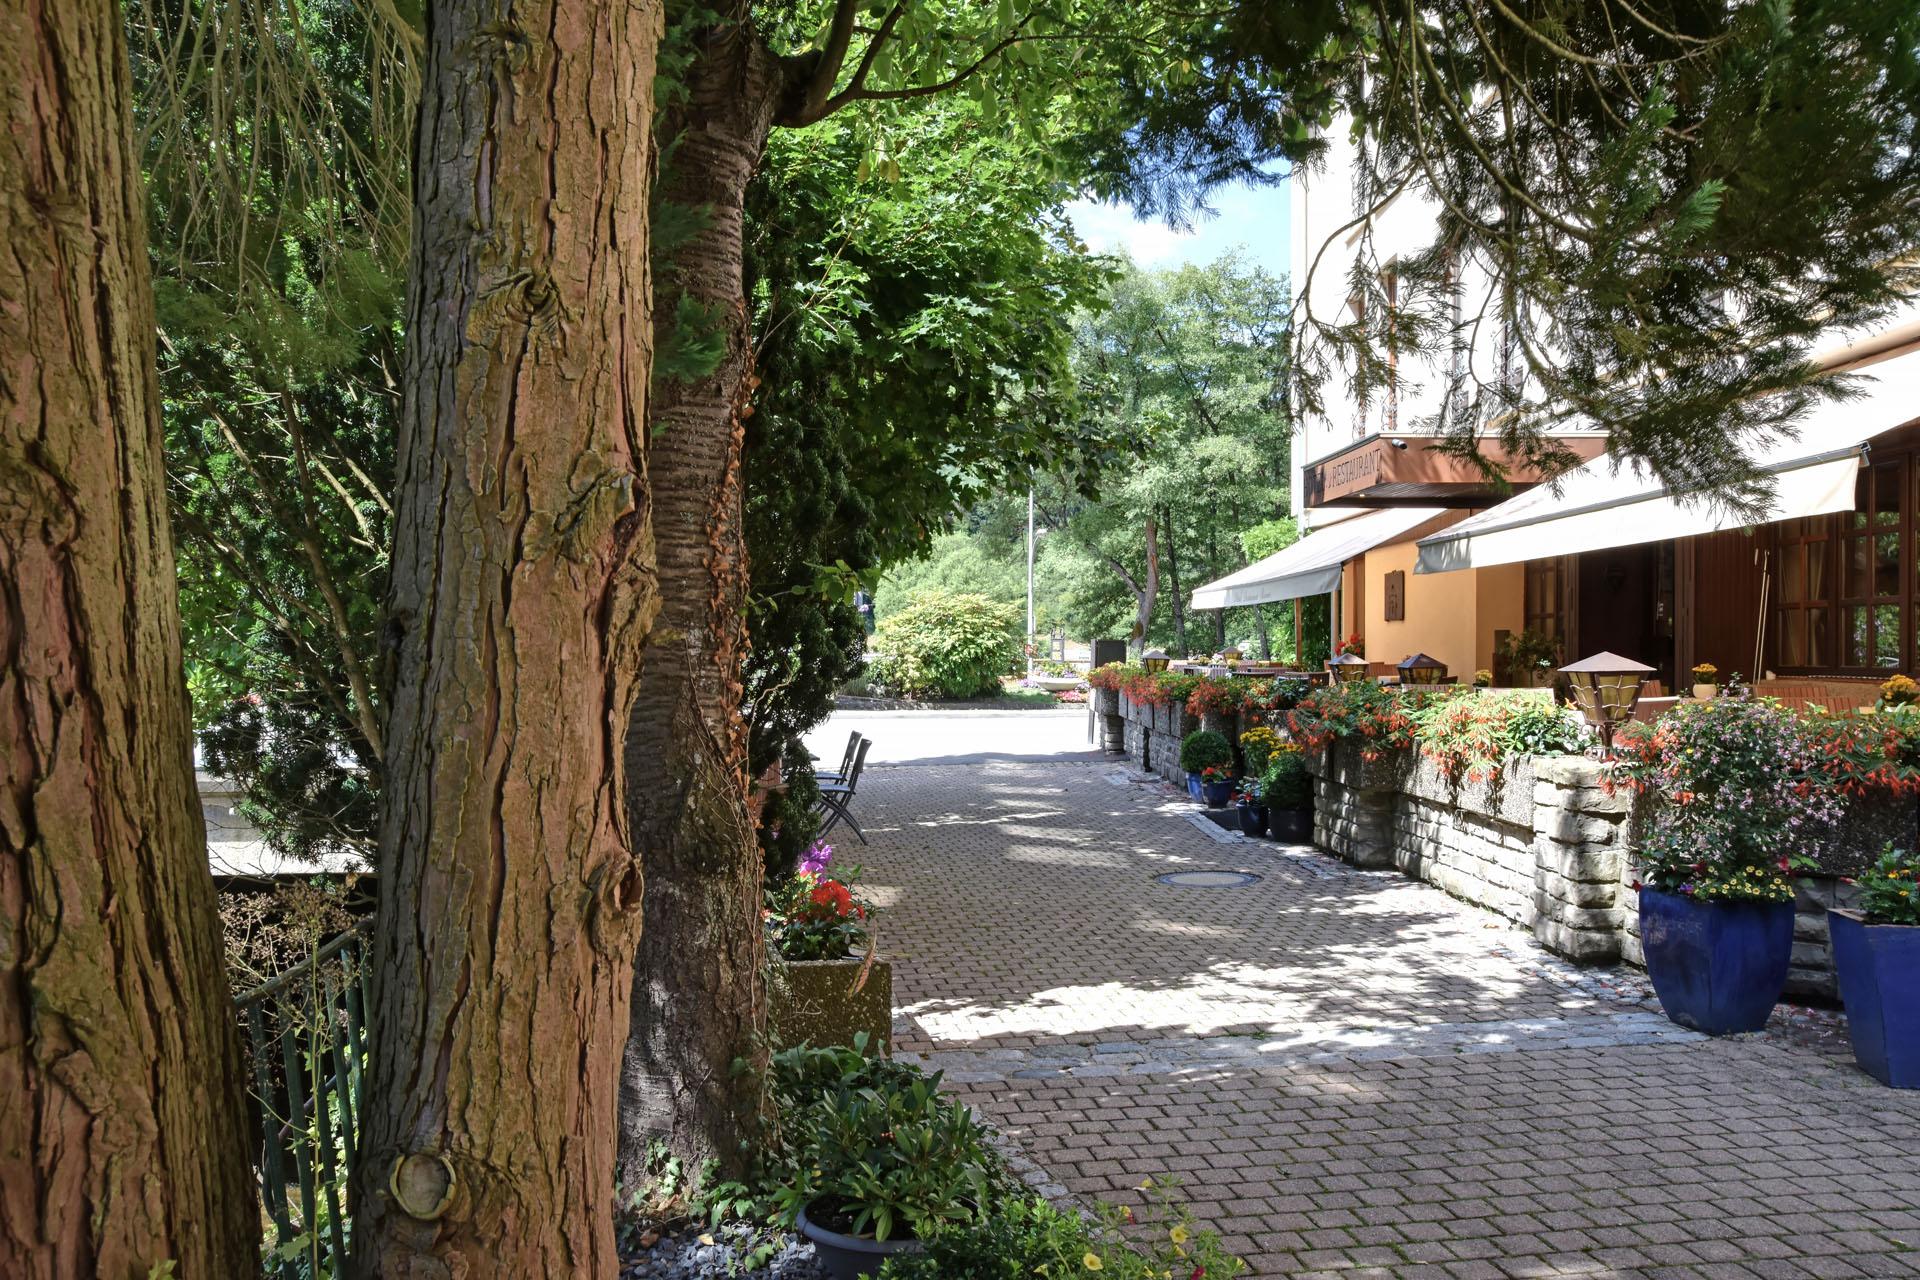 Hotel Brimer - Hotel Brimer